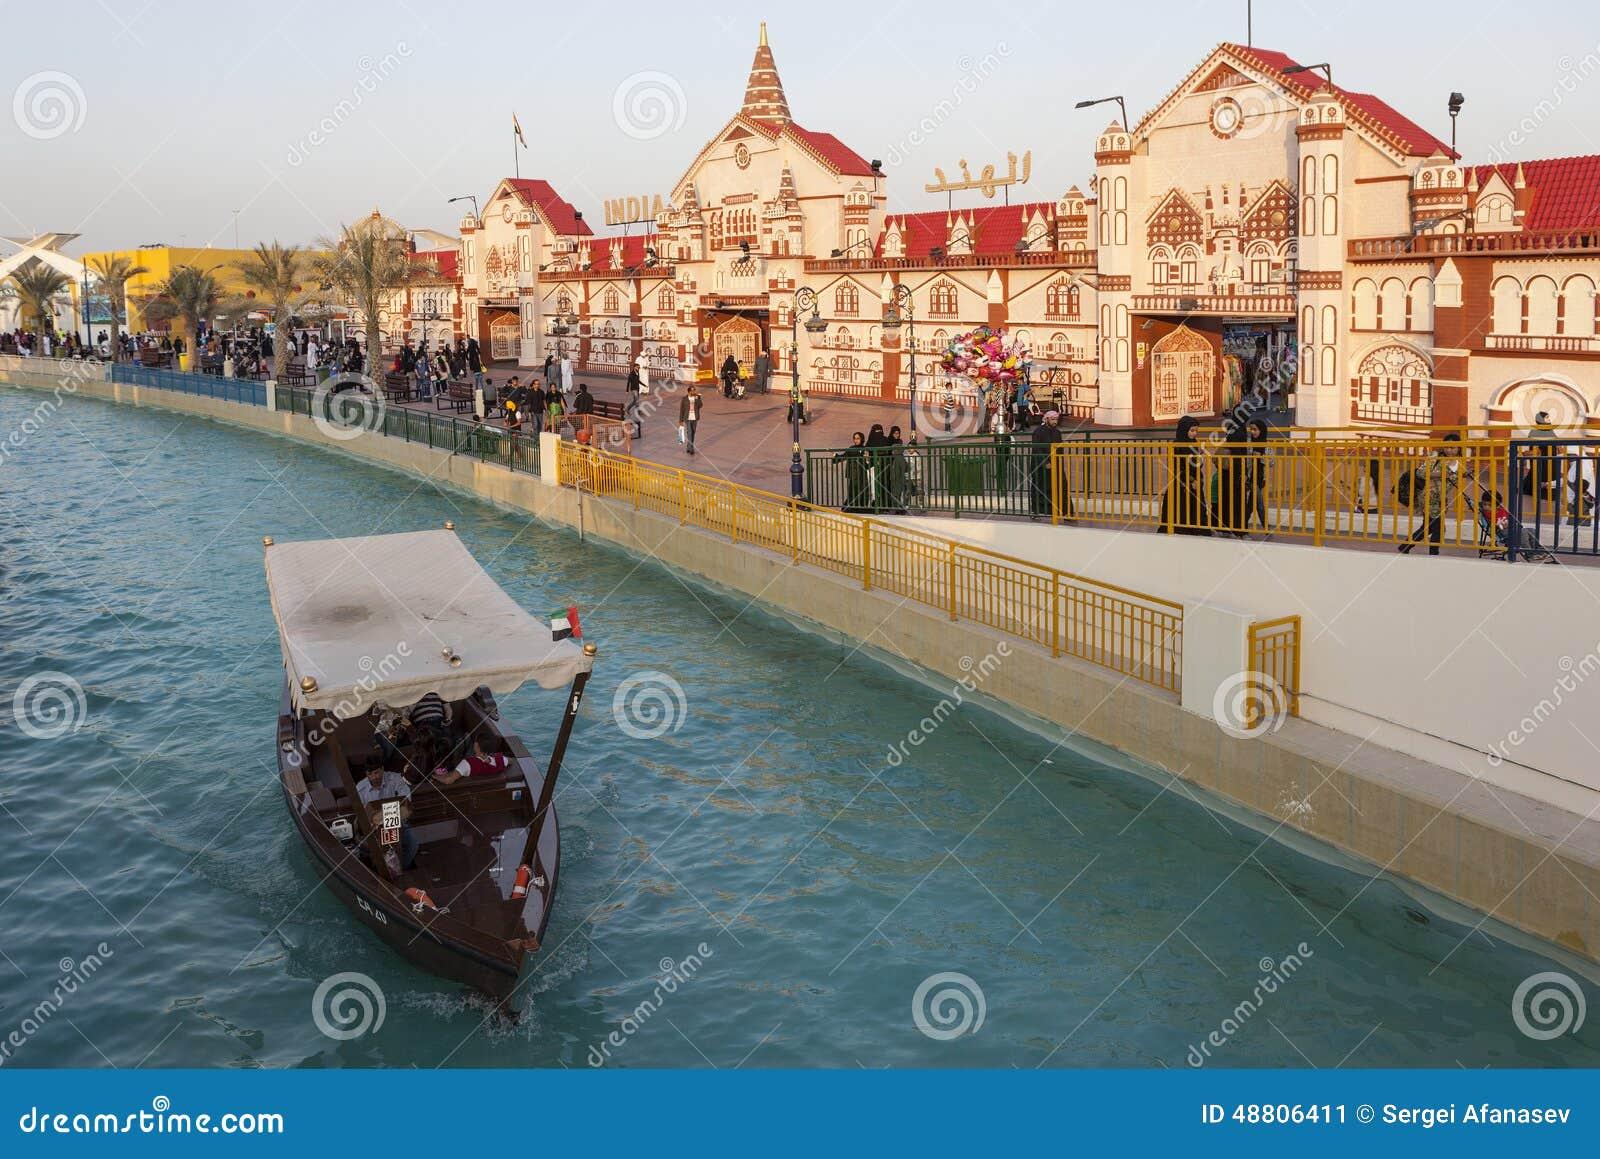 Aldeia global justa (vila do mundo) dubai United Arab Emirates